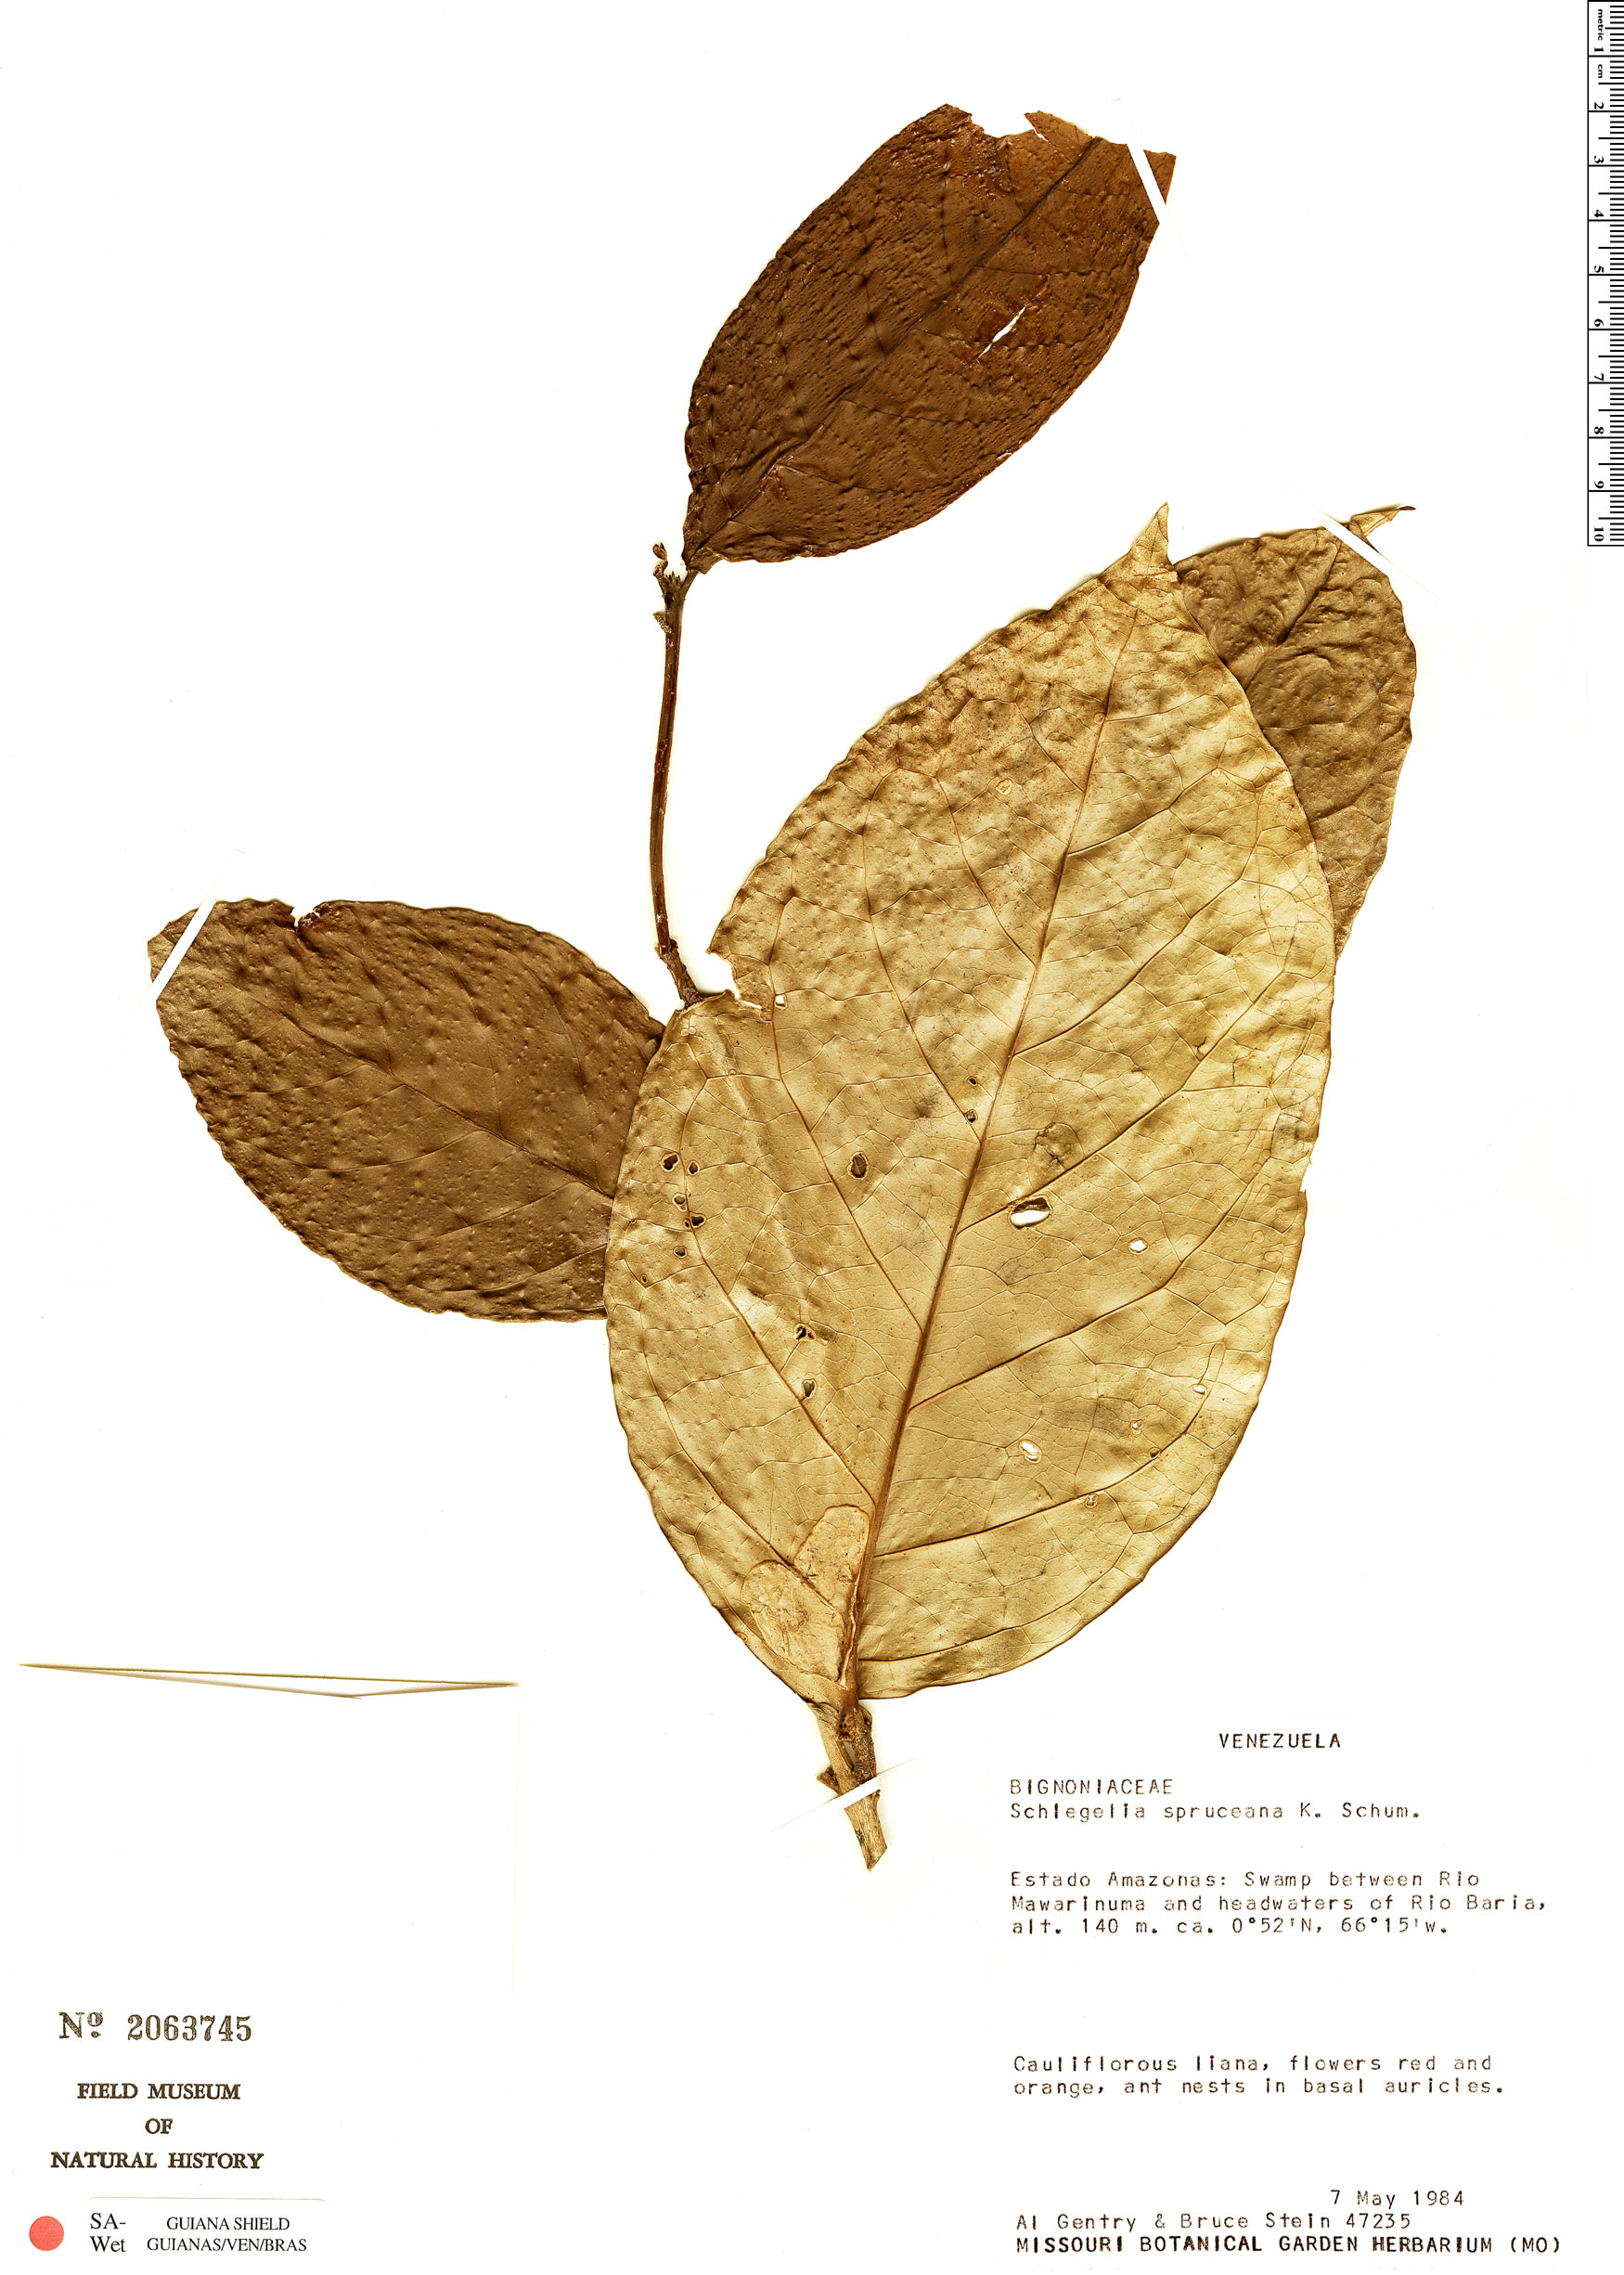 Specimen: Schlegelia spruceana